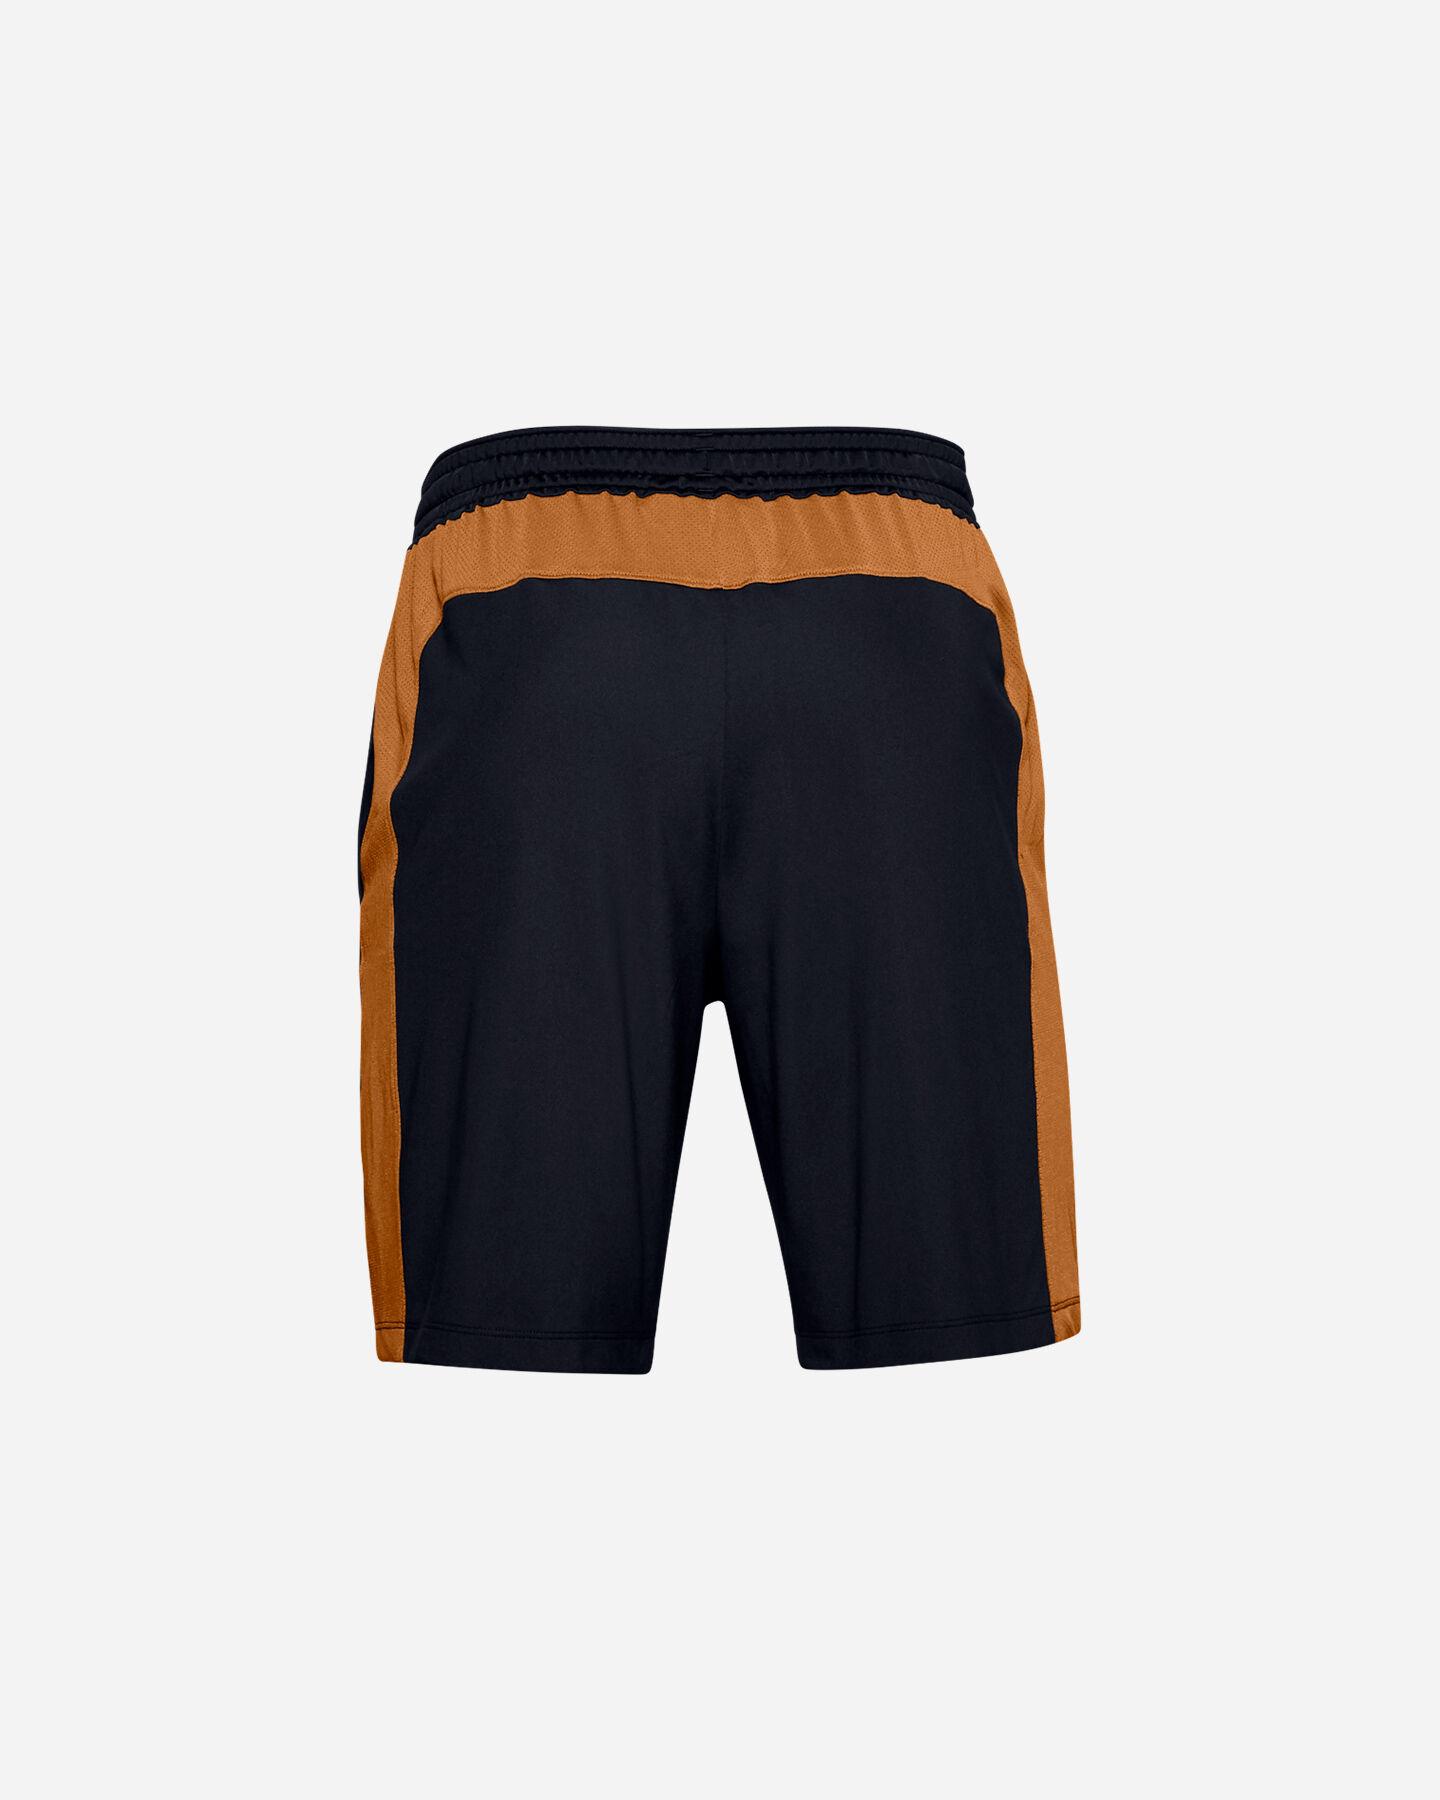 Pantalone training UNDER ARMOUR MK1 M S5228329 scatto 1